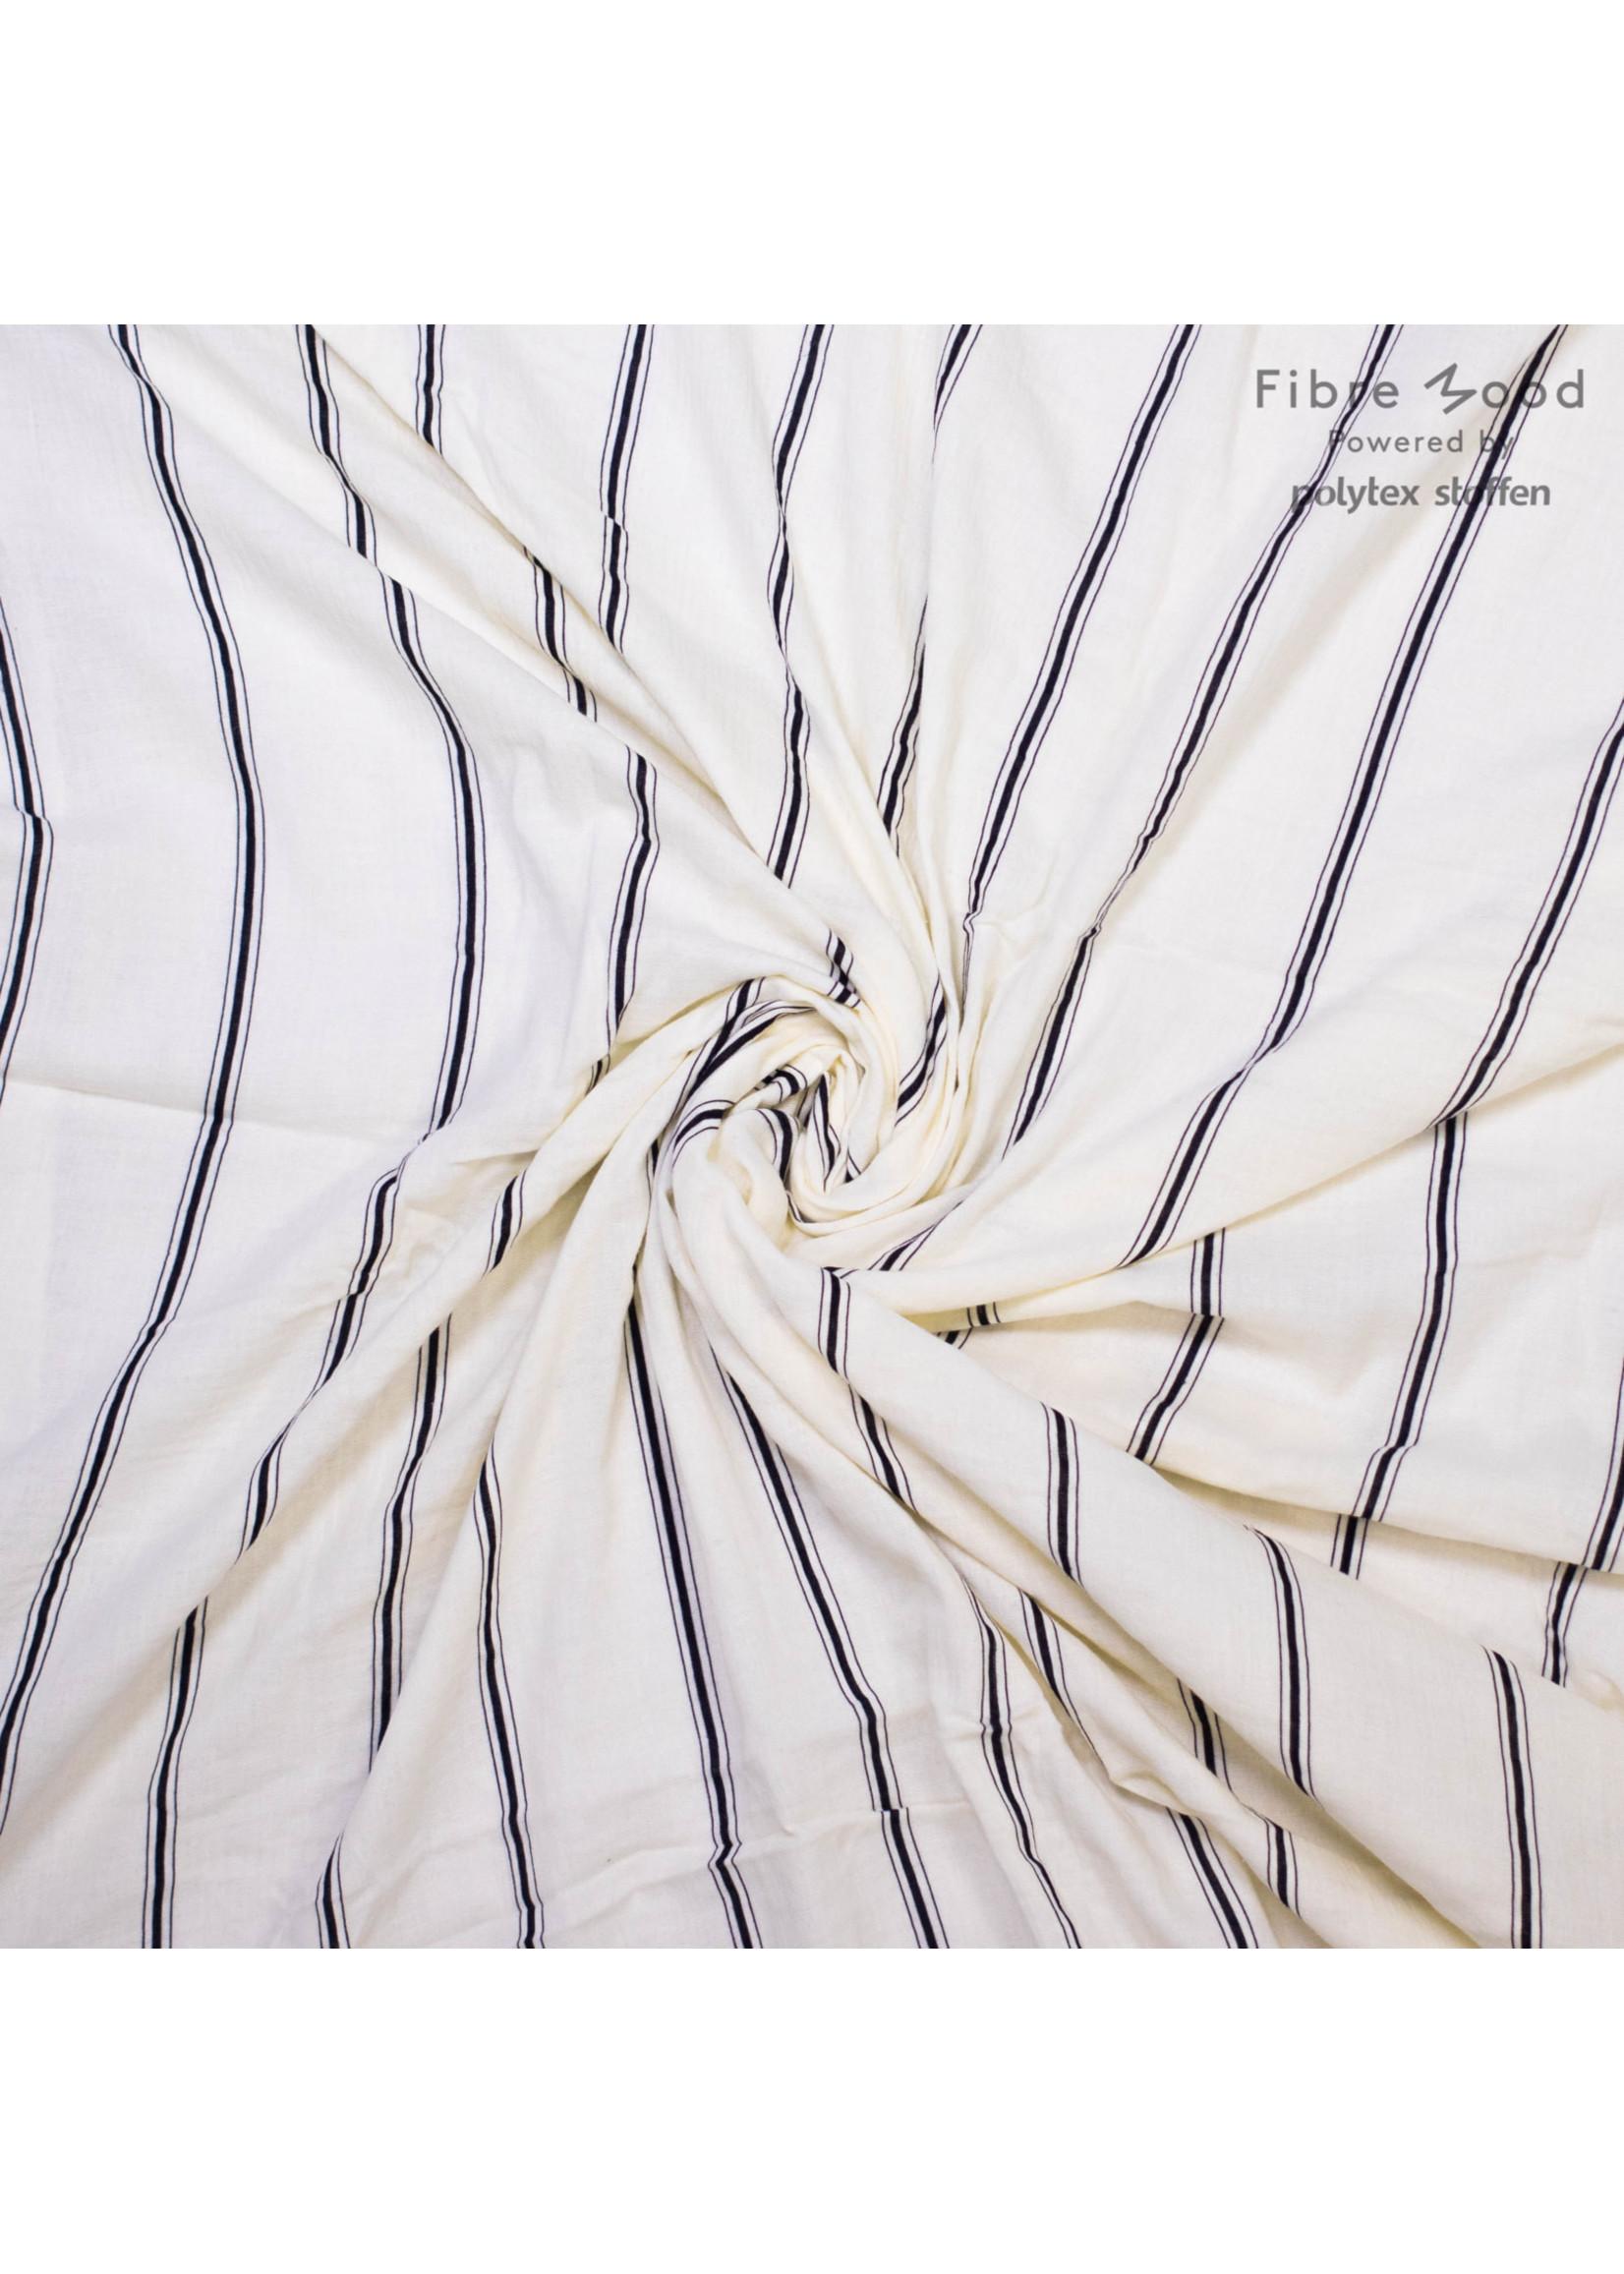 Fibre Mood Woven white with black stripes